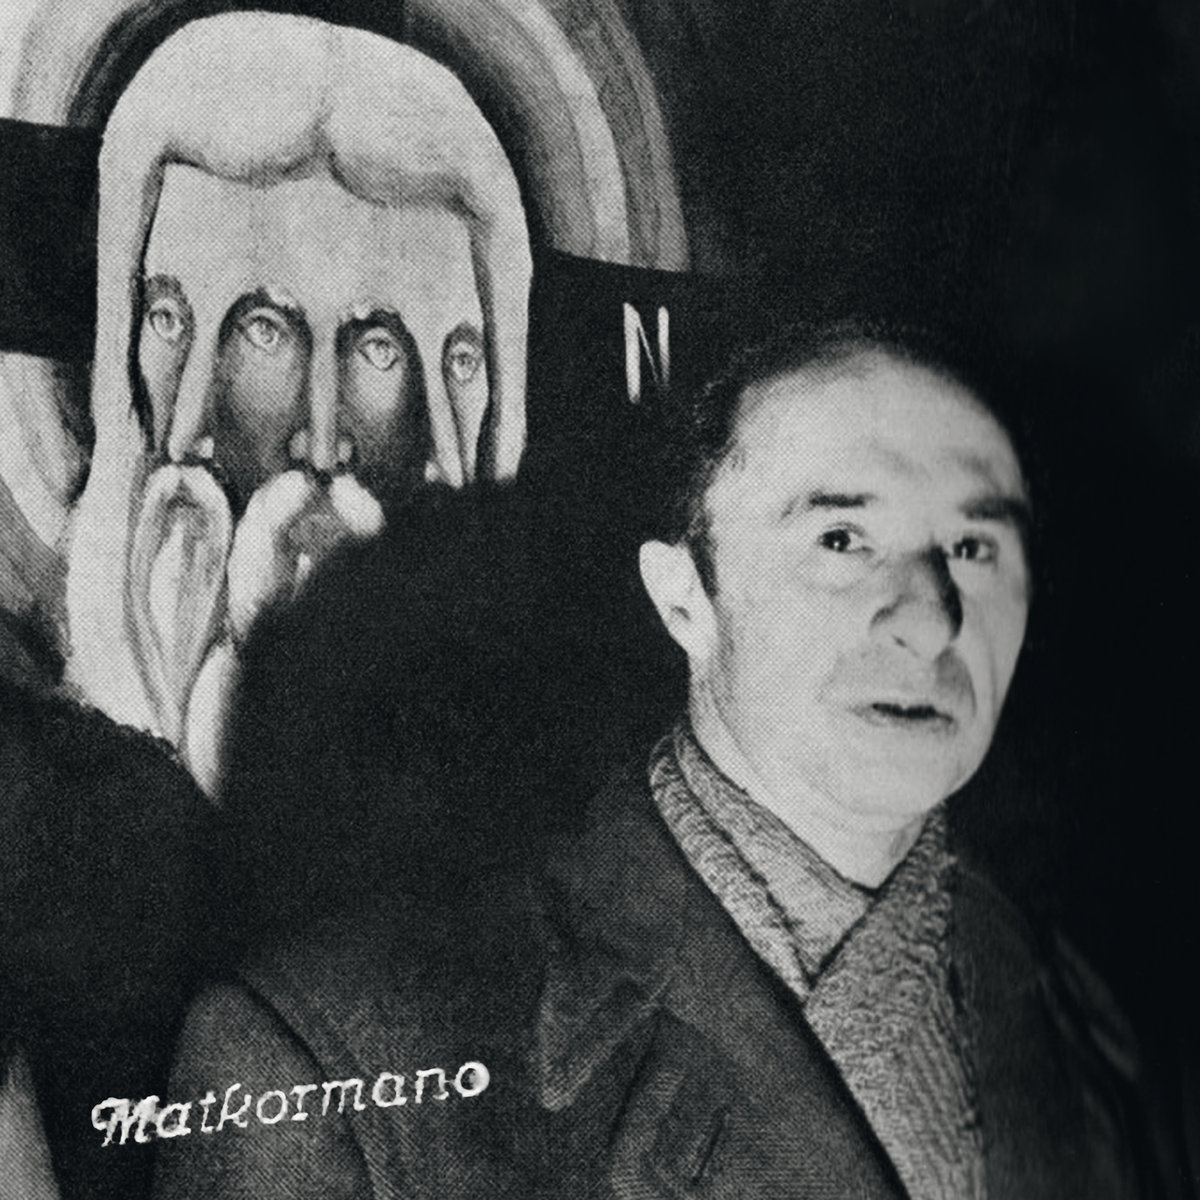 2:13 PM Matkormano - Vinyl LP (white with grey and black swirls)